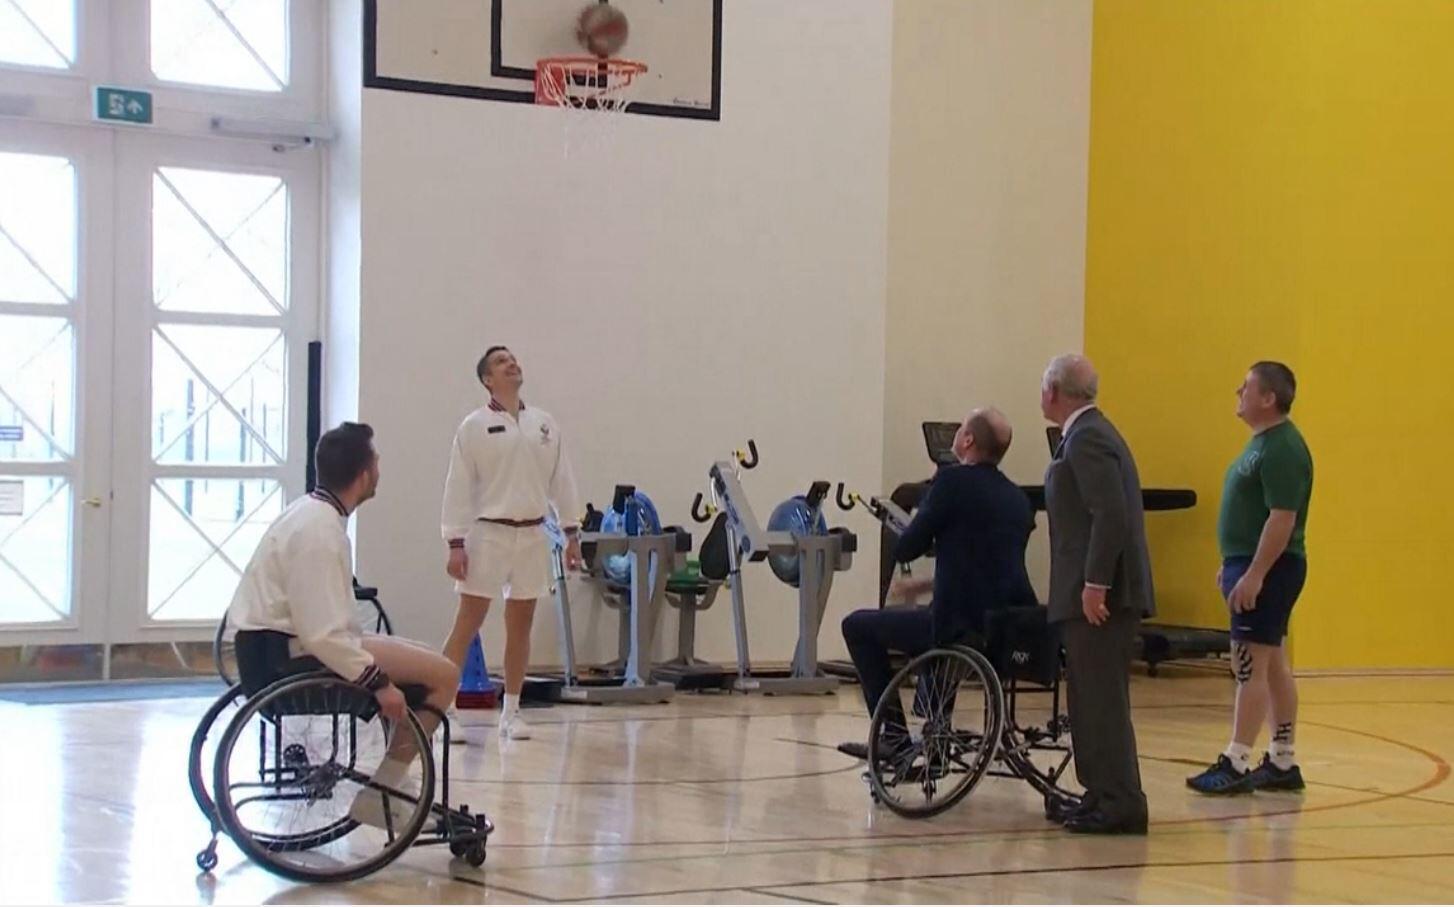 Bild zu Royals, Adel, Prinz Charles, Prinz William, Basketball